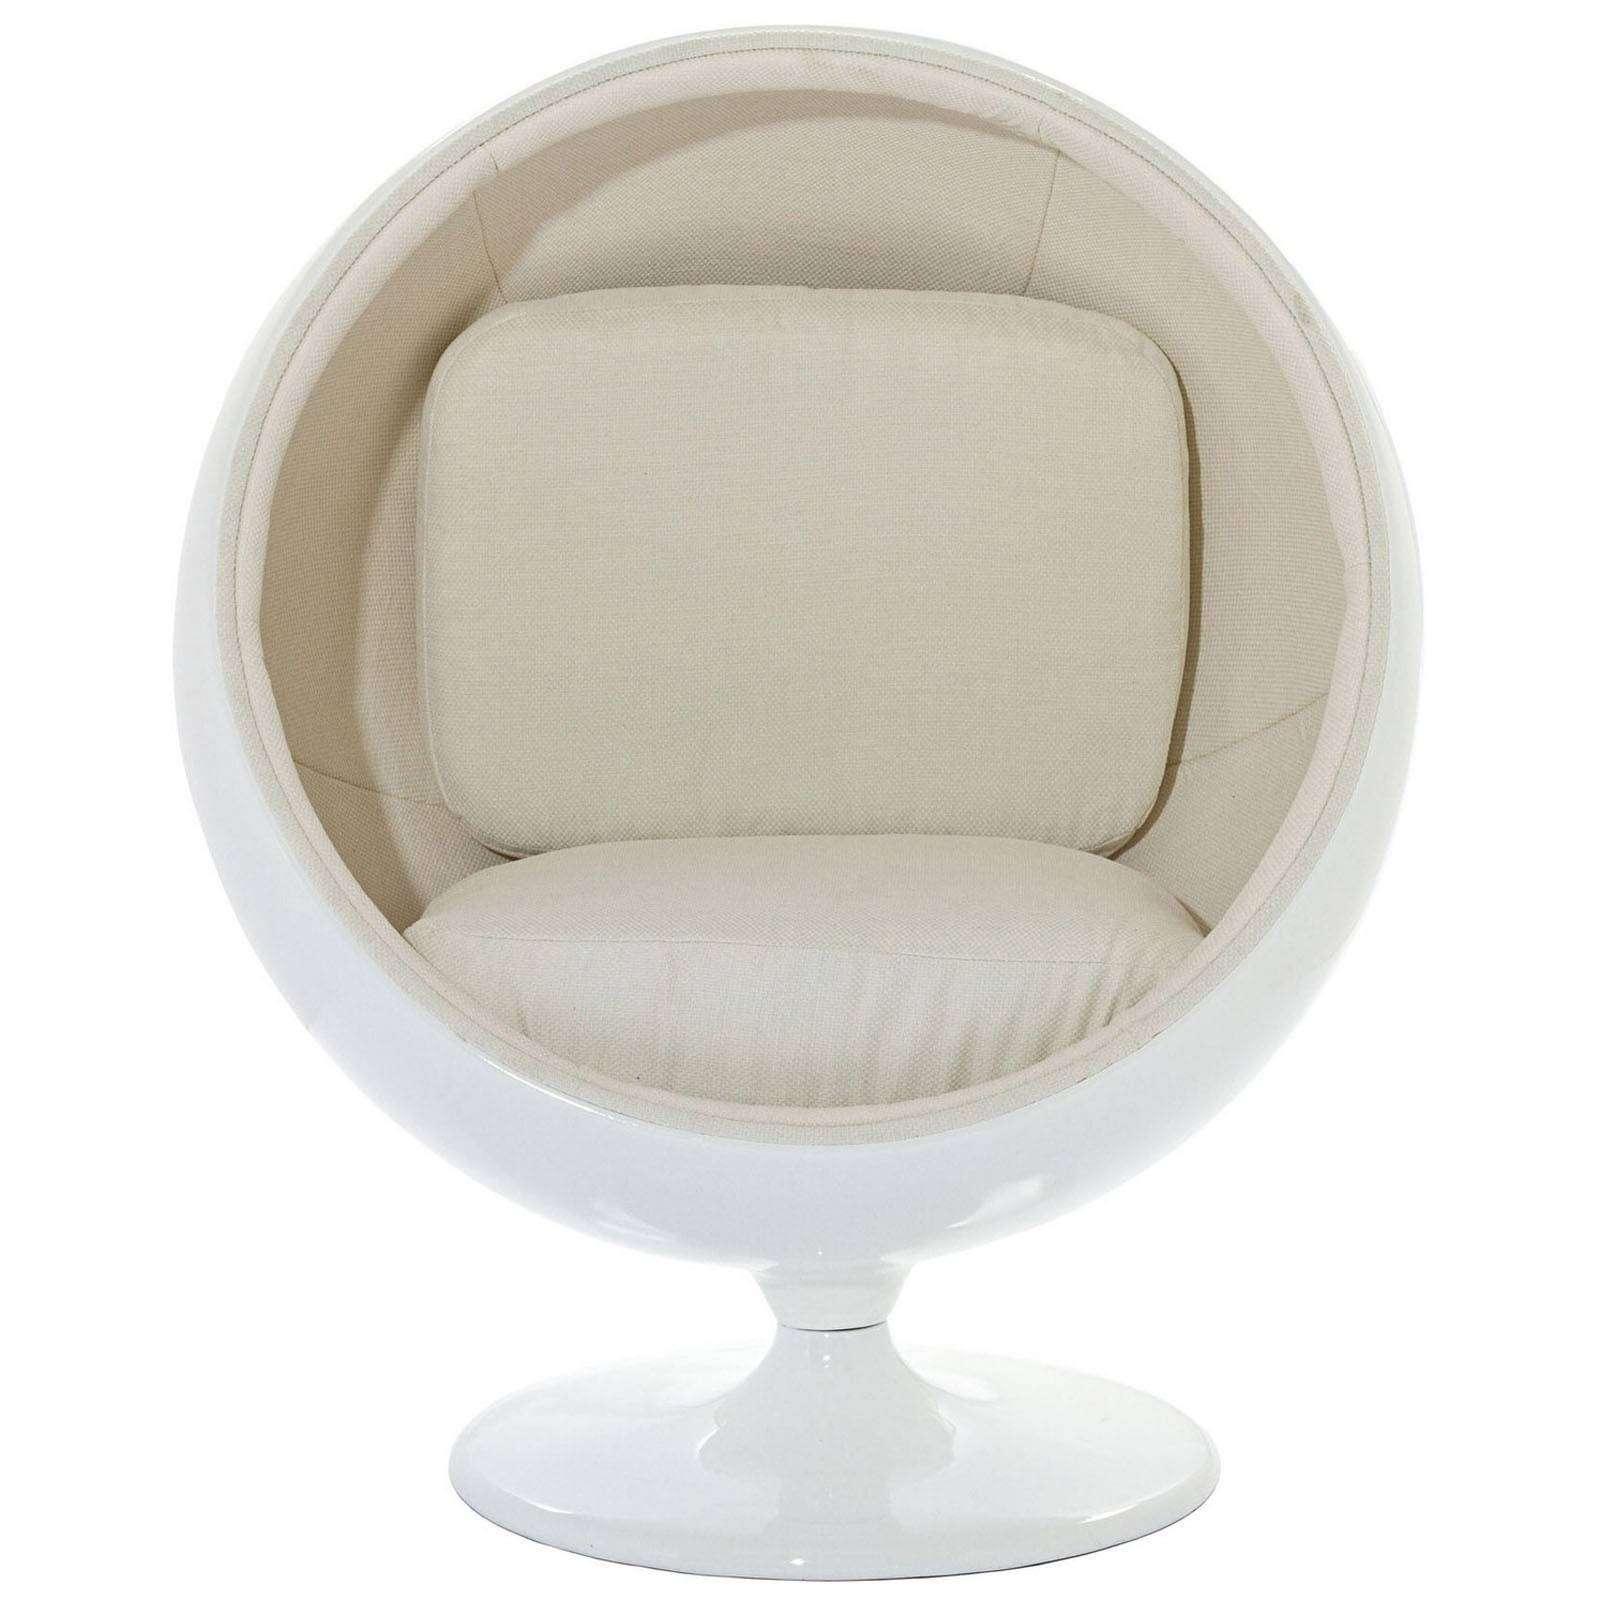 ball chair for kids home studio tub eero aarnio style